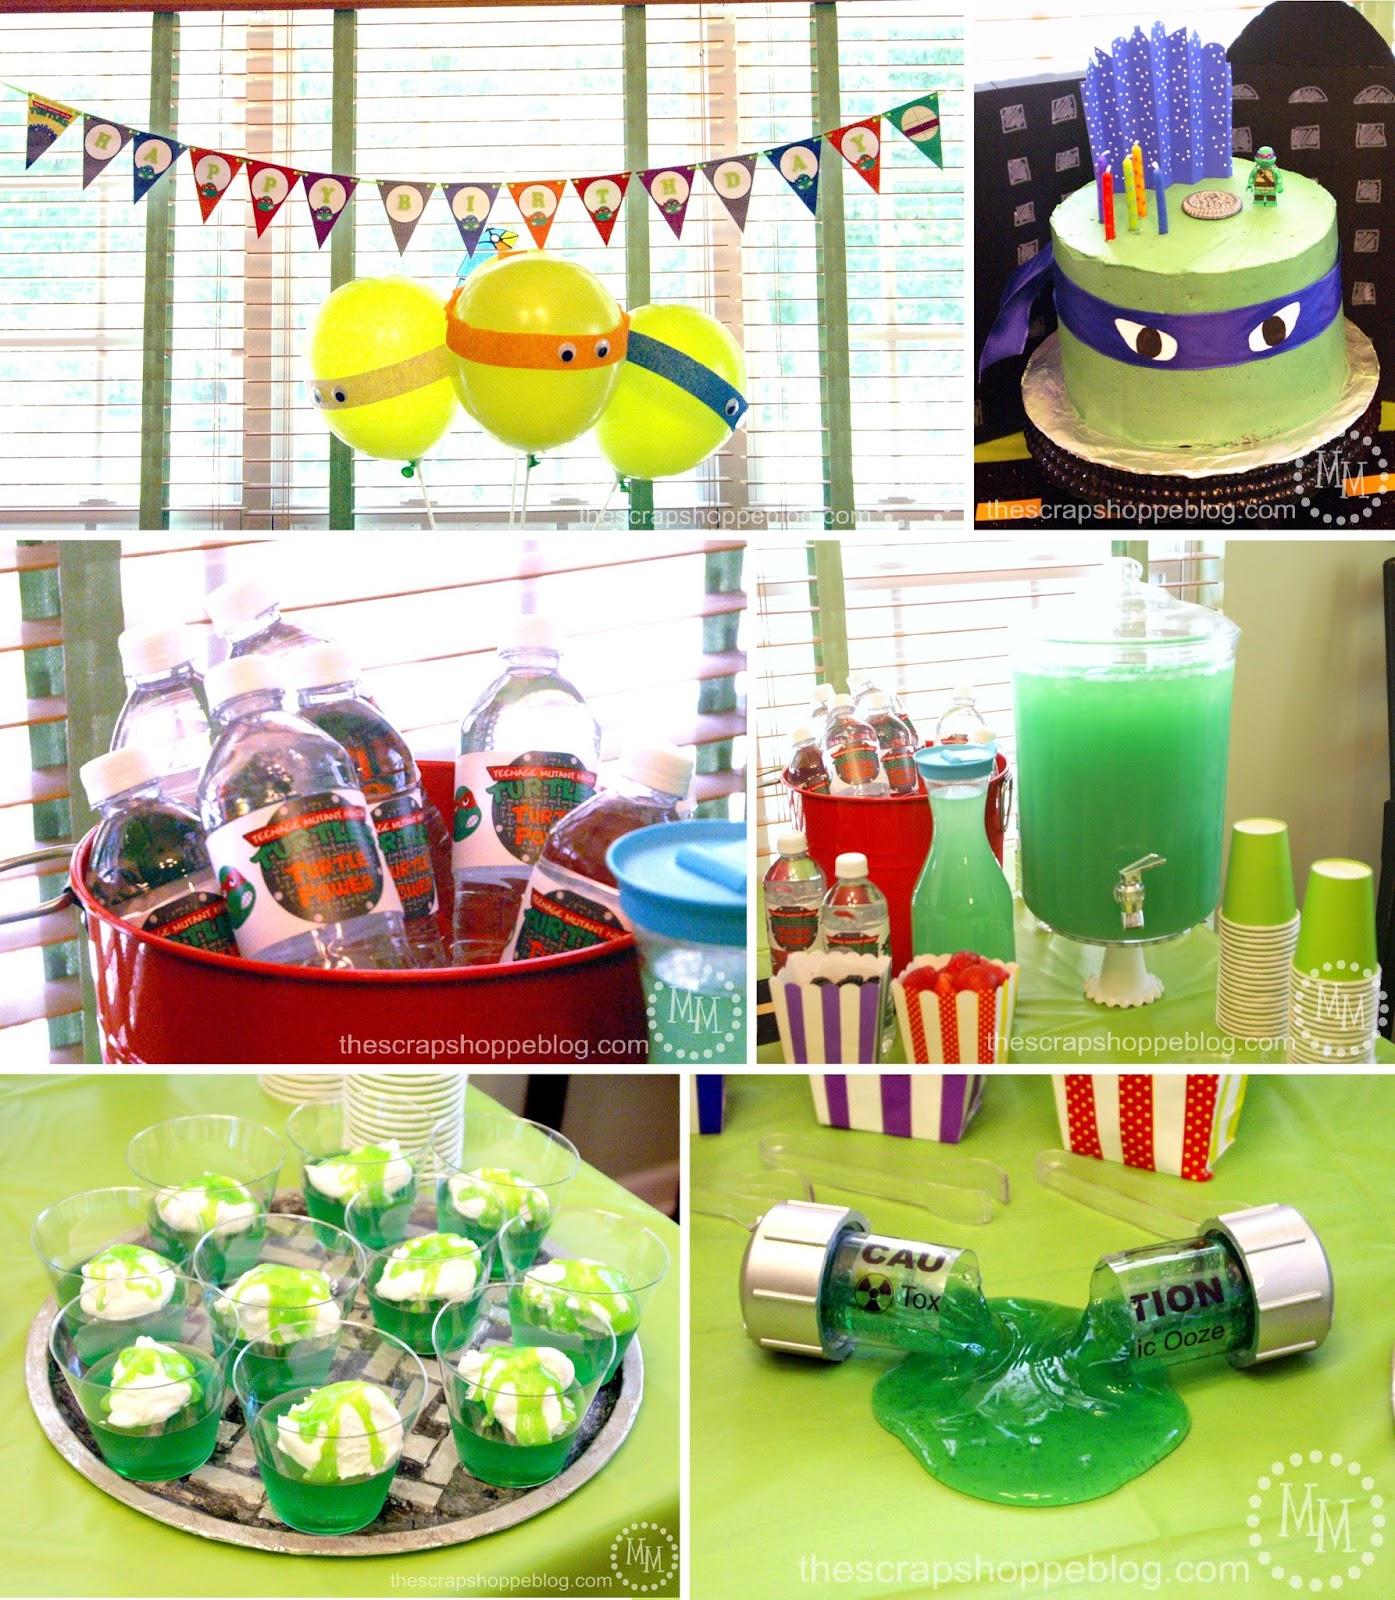 Teenage Mutant Ninja Turtle (Tmnt) Birthday Party - The Scrap Shoppe - Free Printable Teenage Mutant Ninja Turtle Cupcake Toppers